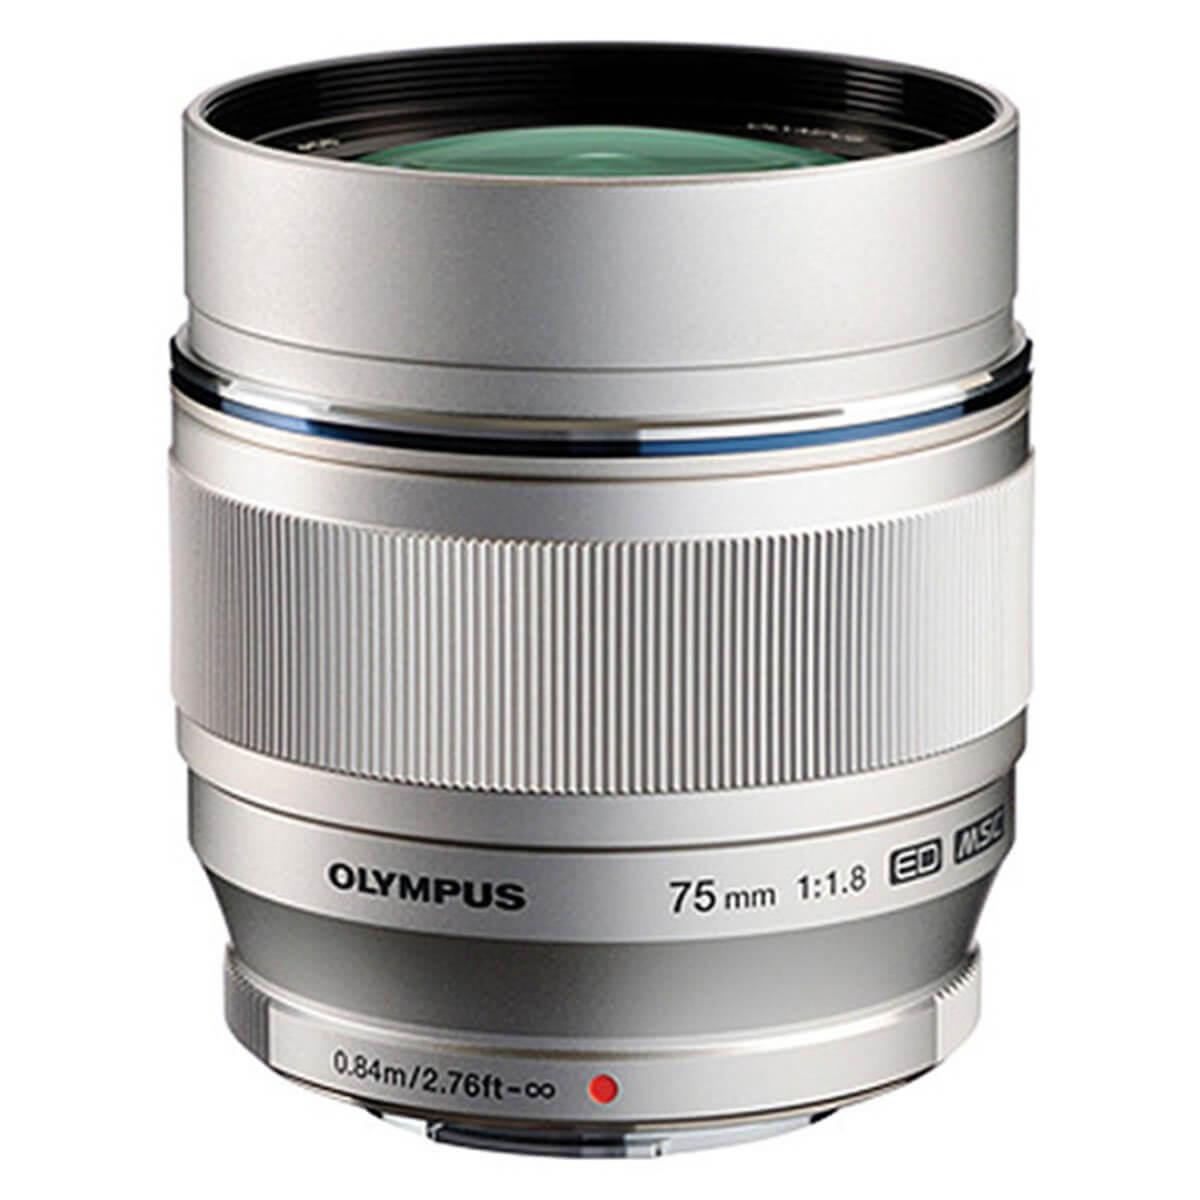 Olympus M.Zuiko 75mm f1.8 Digital ED Silver